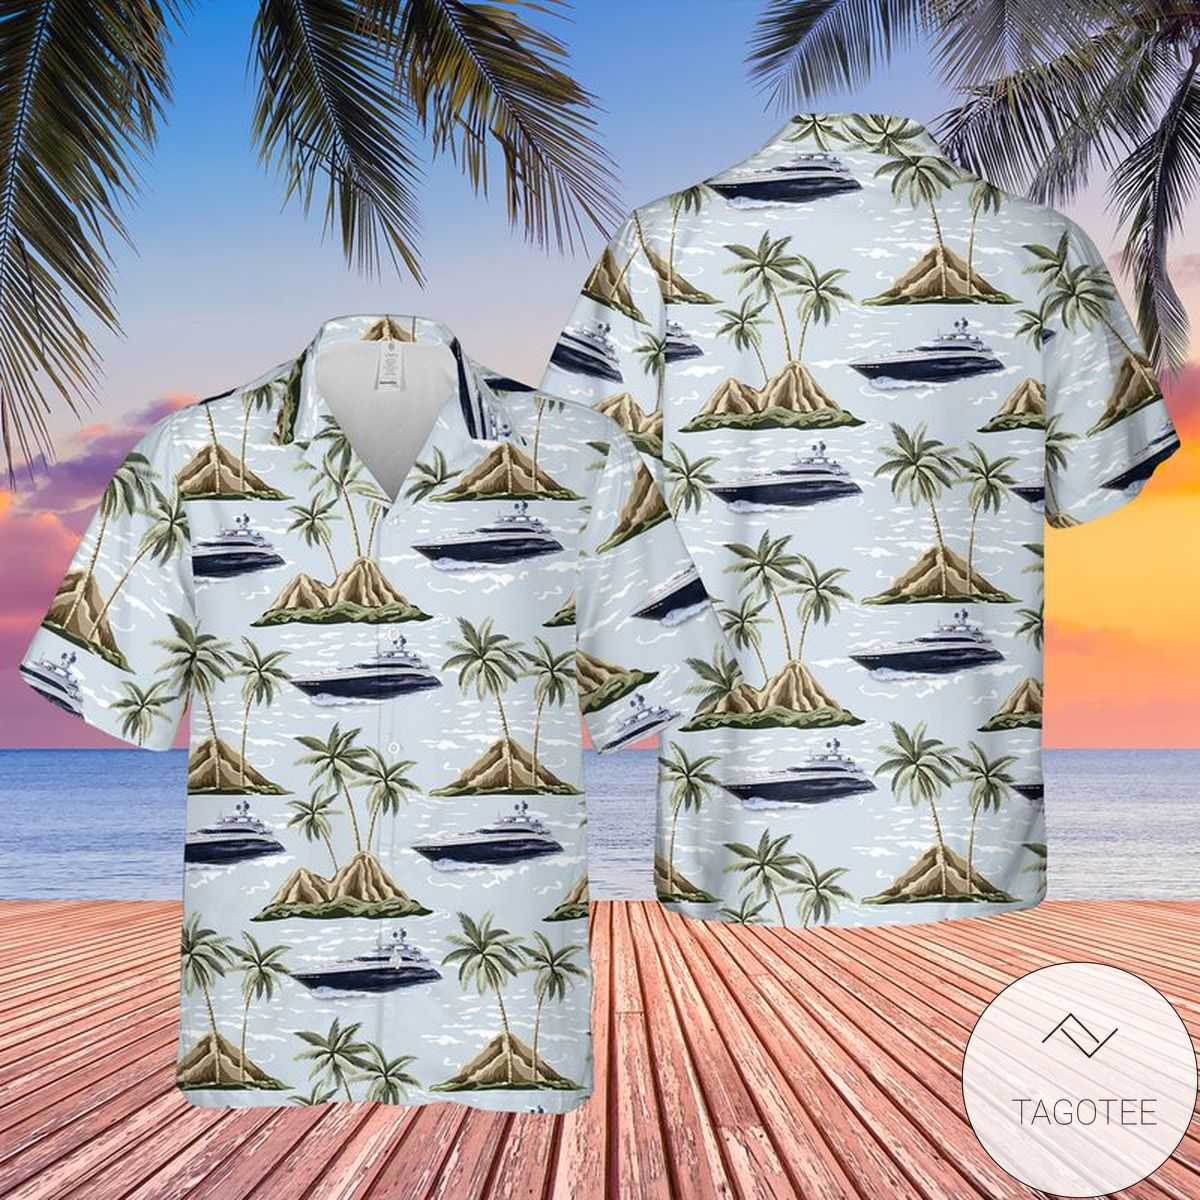 Princess Yachts America Hawaiian Shirt, Beach Shorts